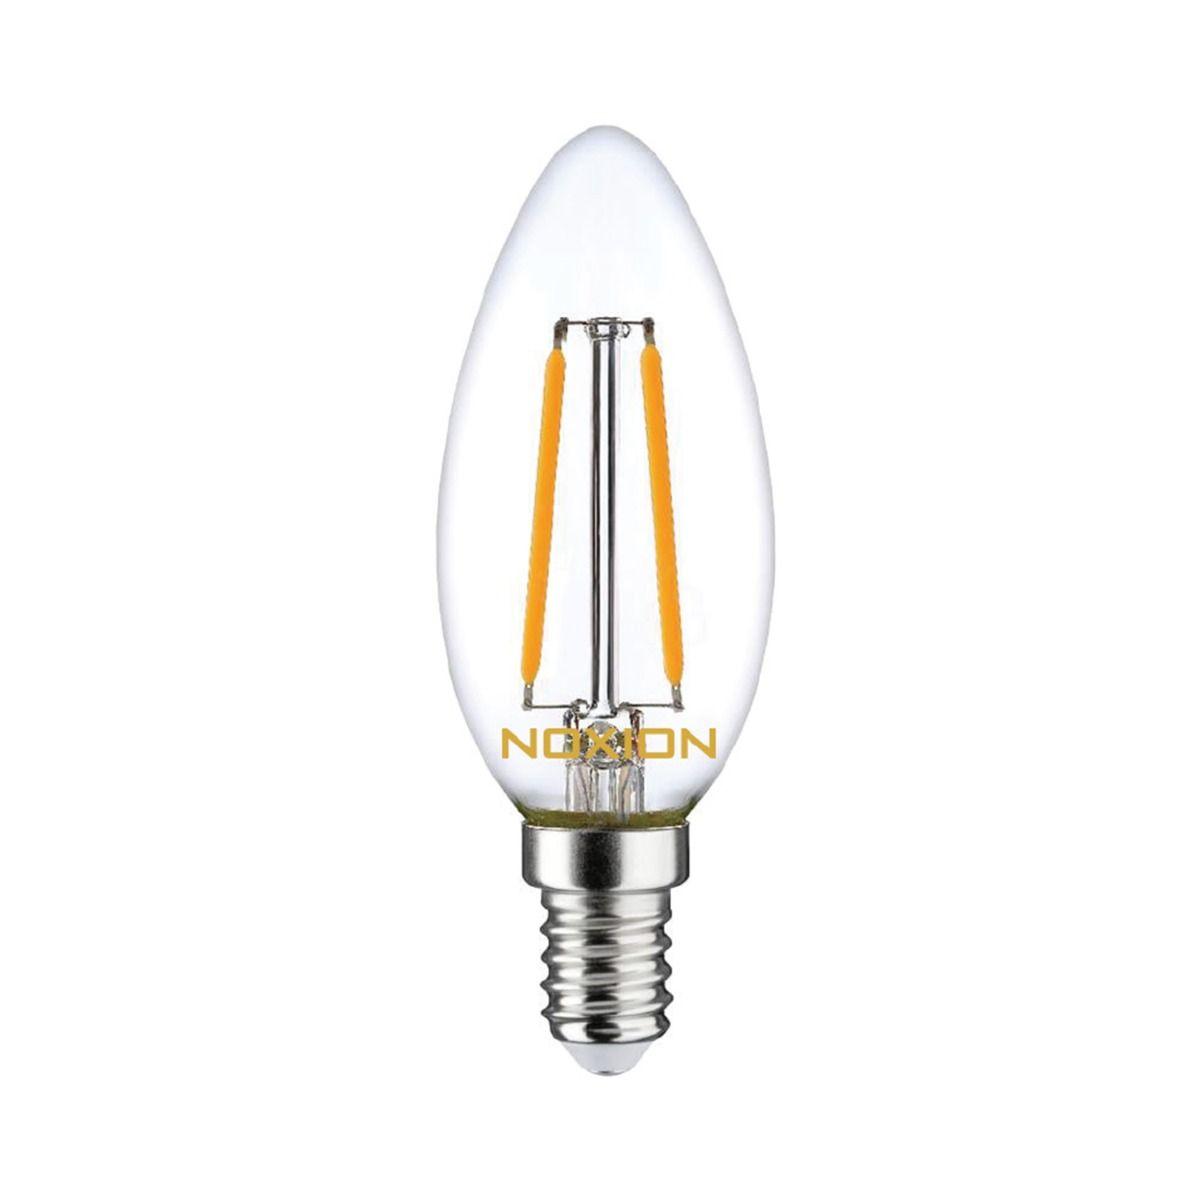 Noxion Lucent Kooldraad LED Candle 2.5W 827 B35 E14 Helder   Vervanger voor 25W